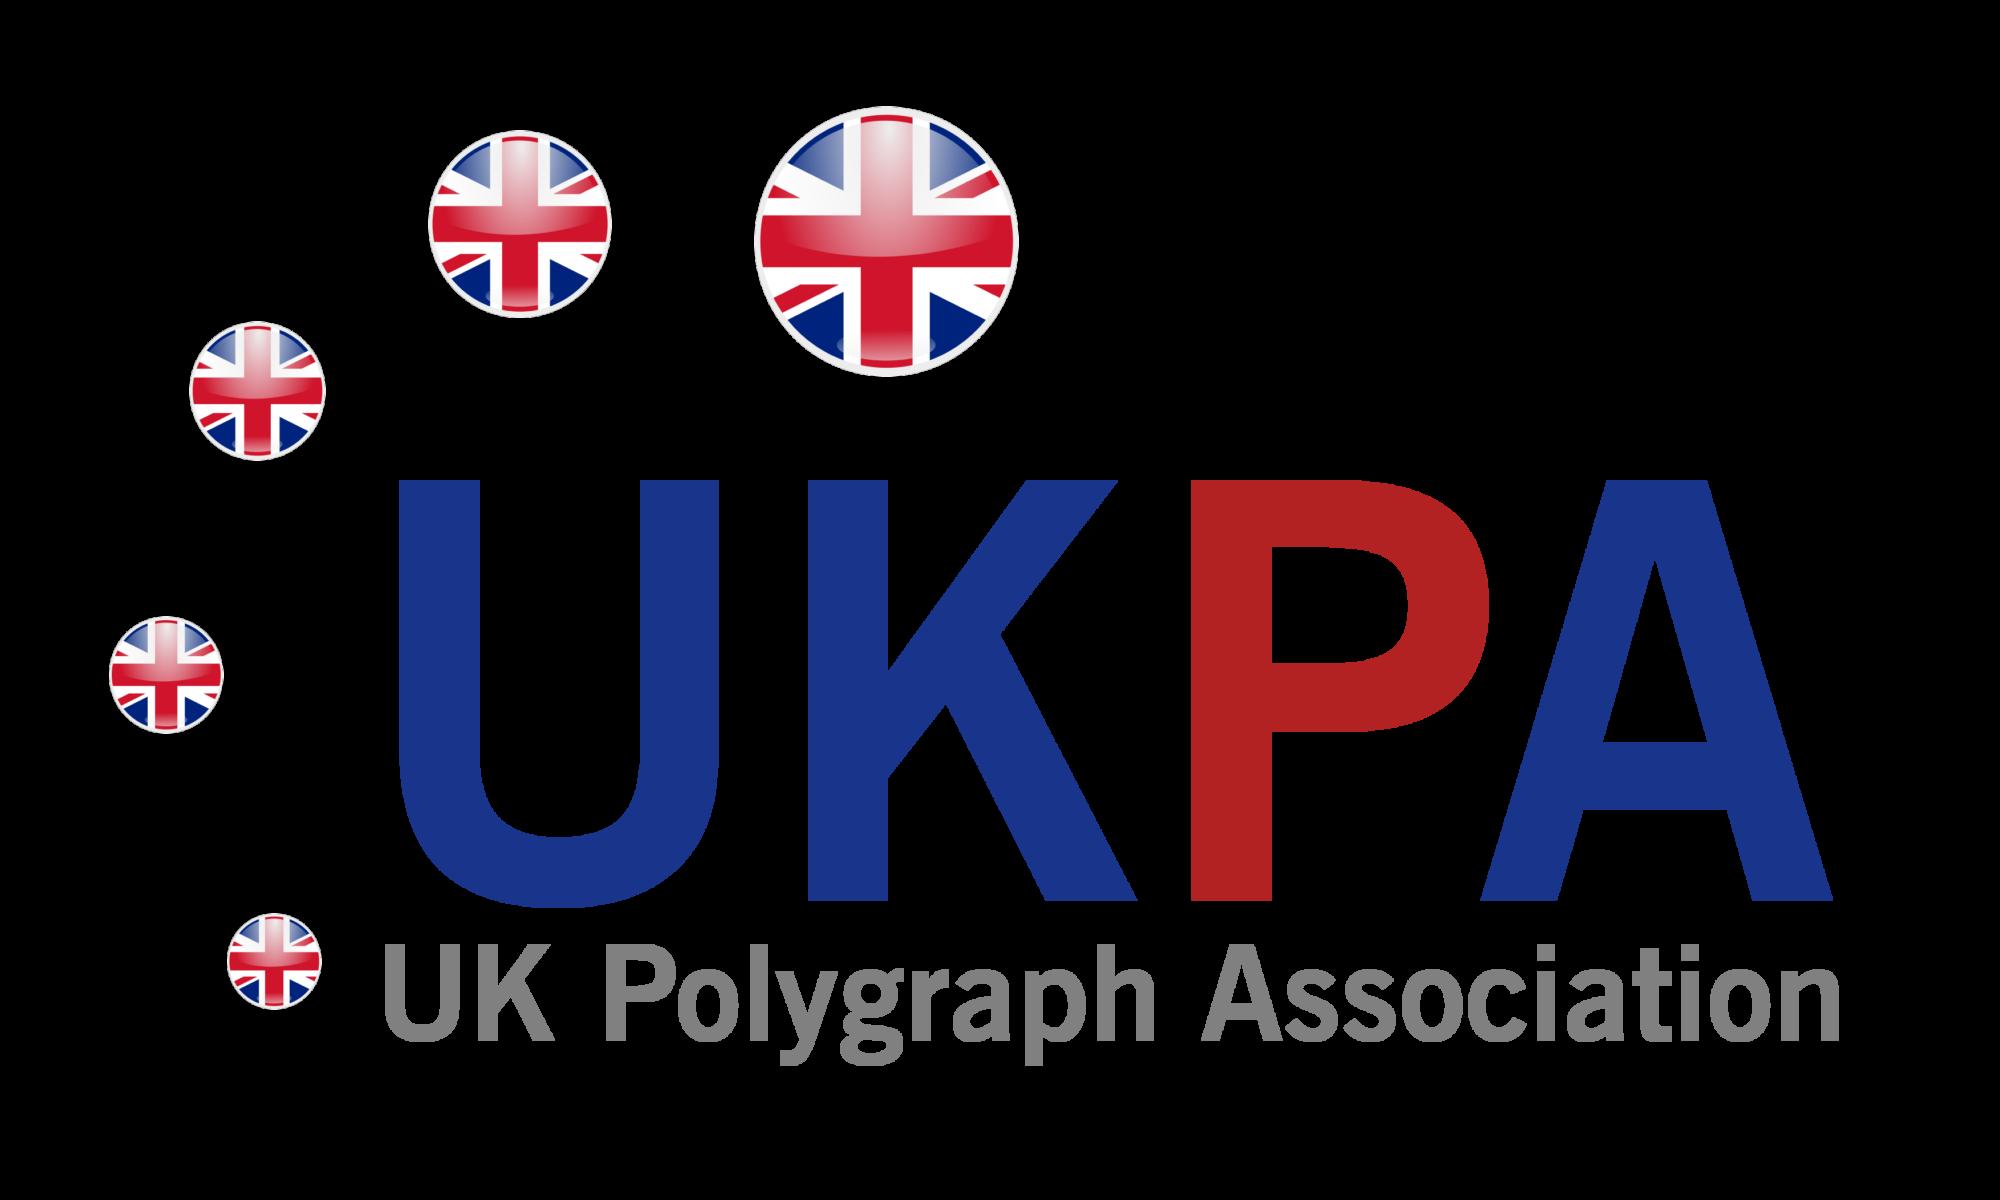 Polygraph Association UK